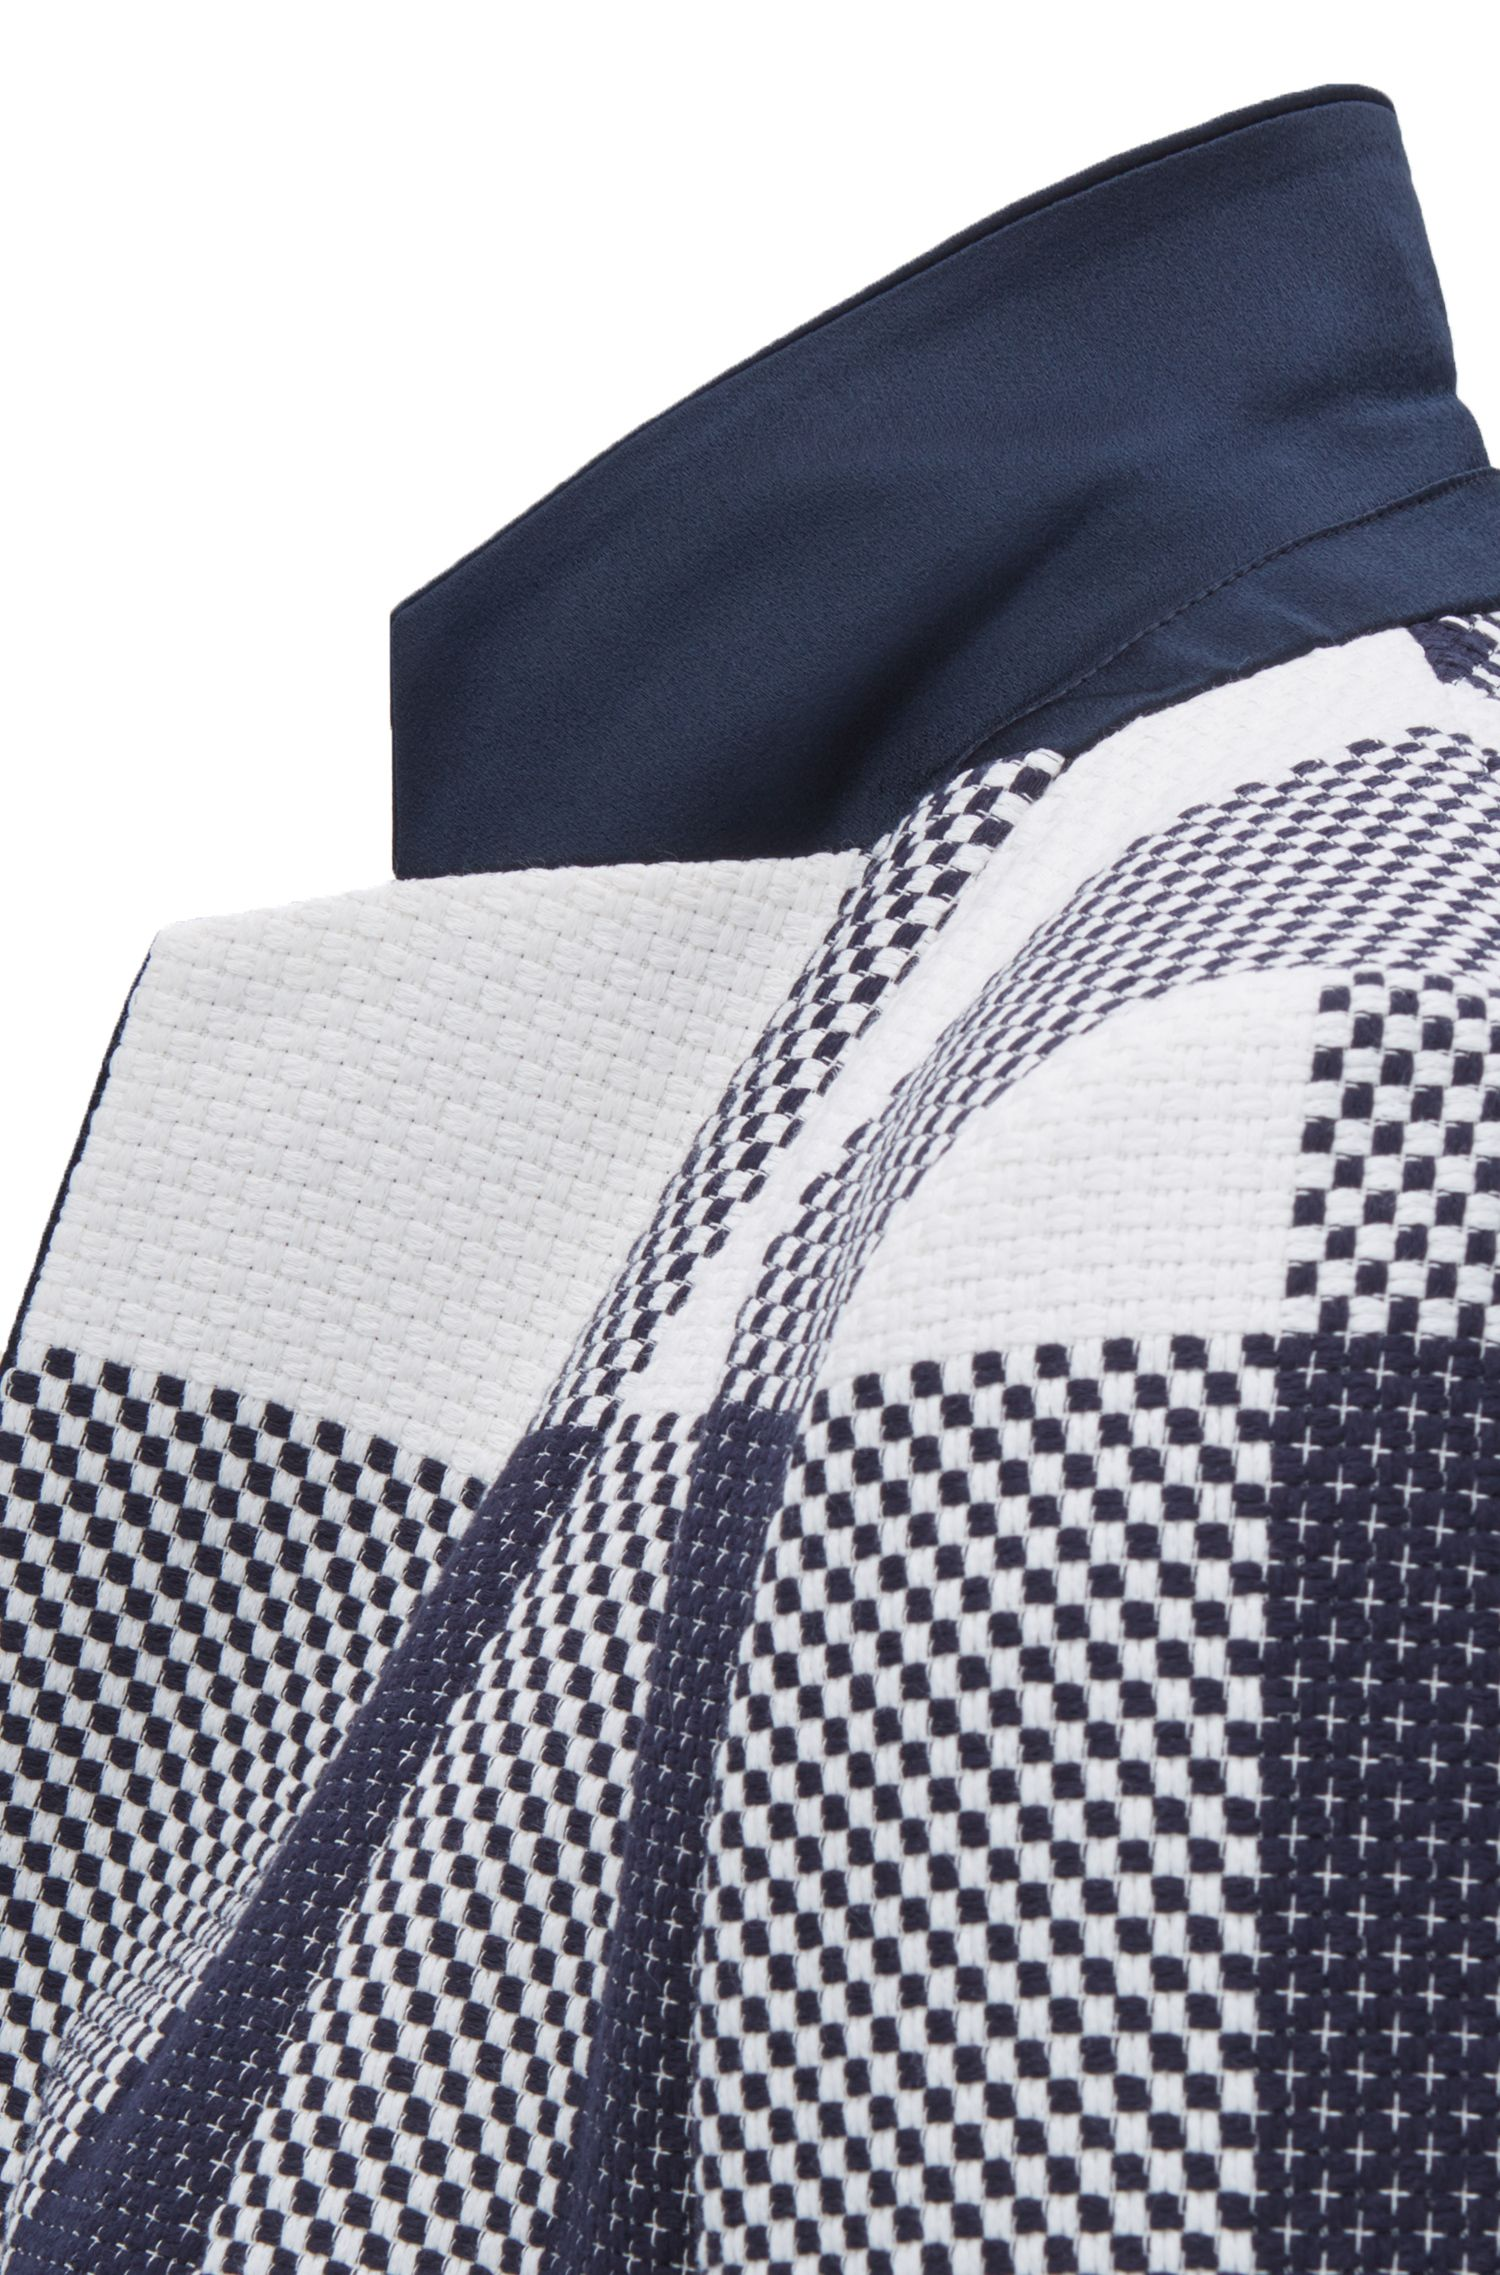 Cotton Plaid Jacket | FS Caleama, Patterned